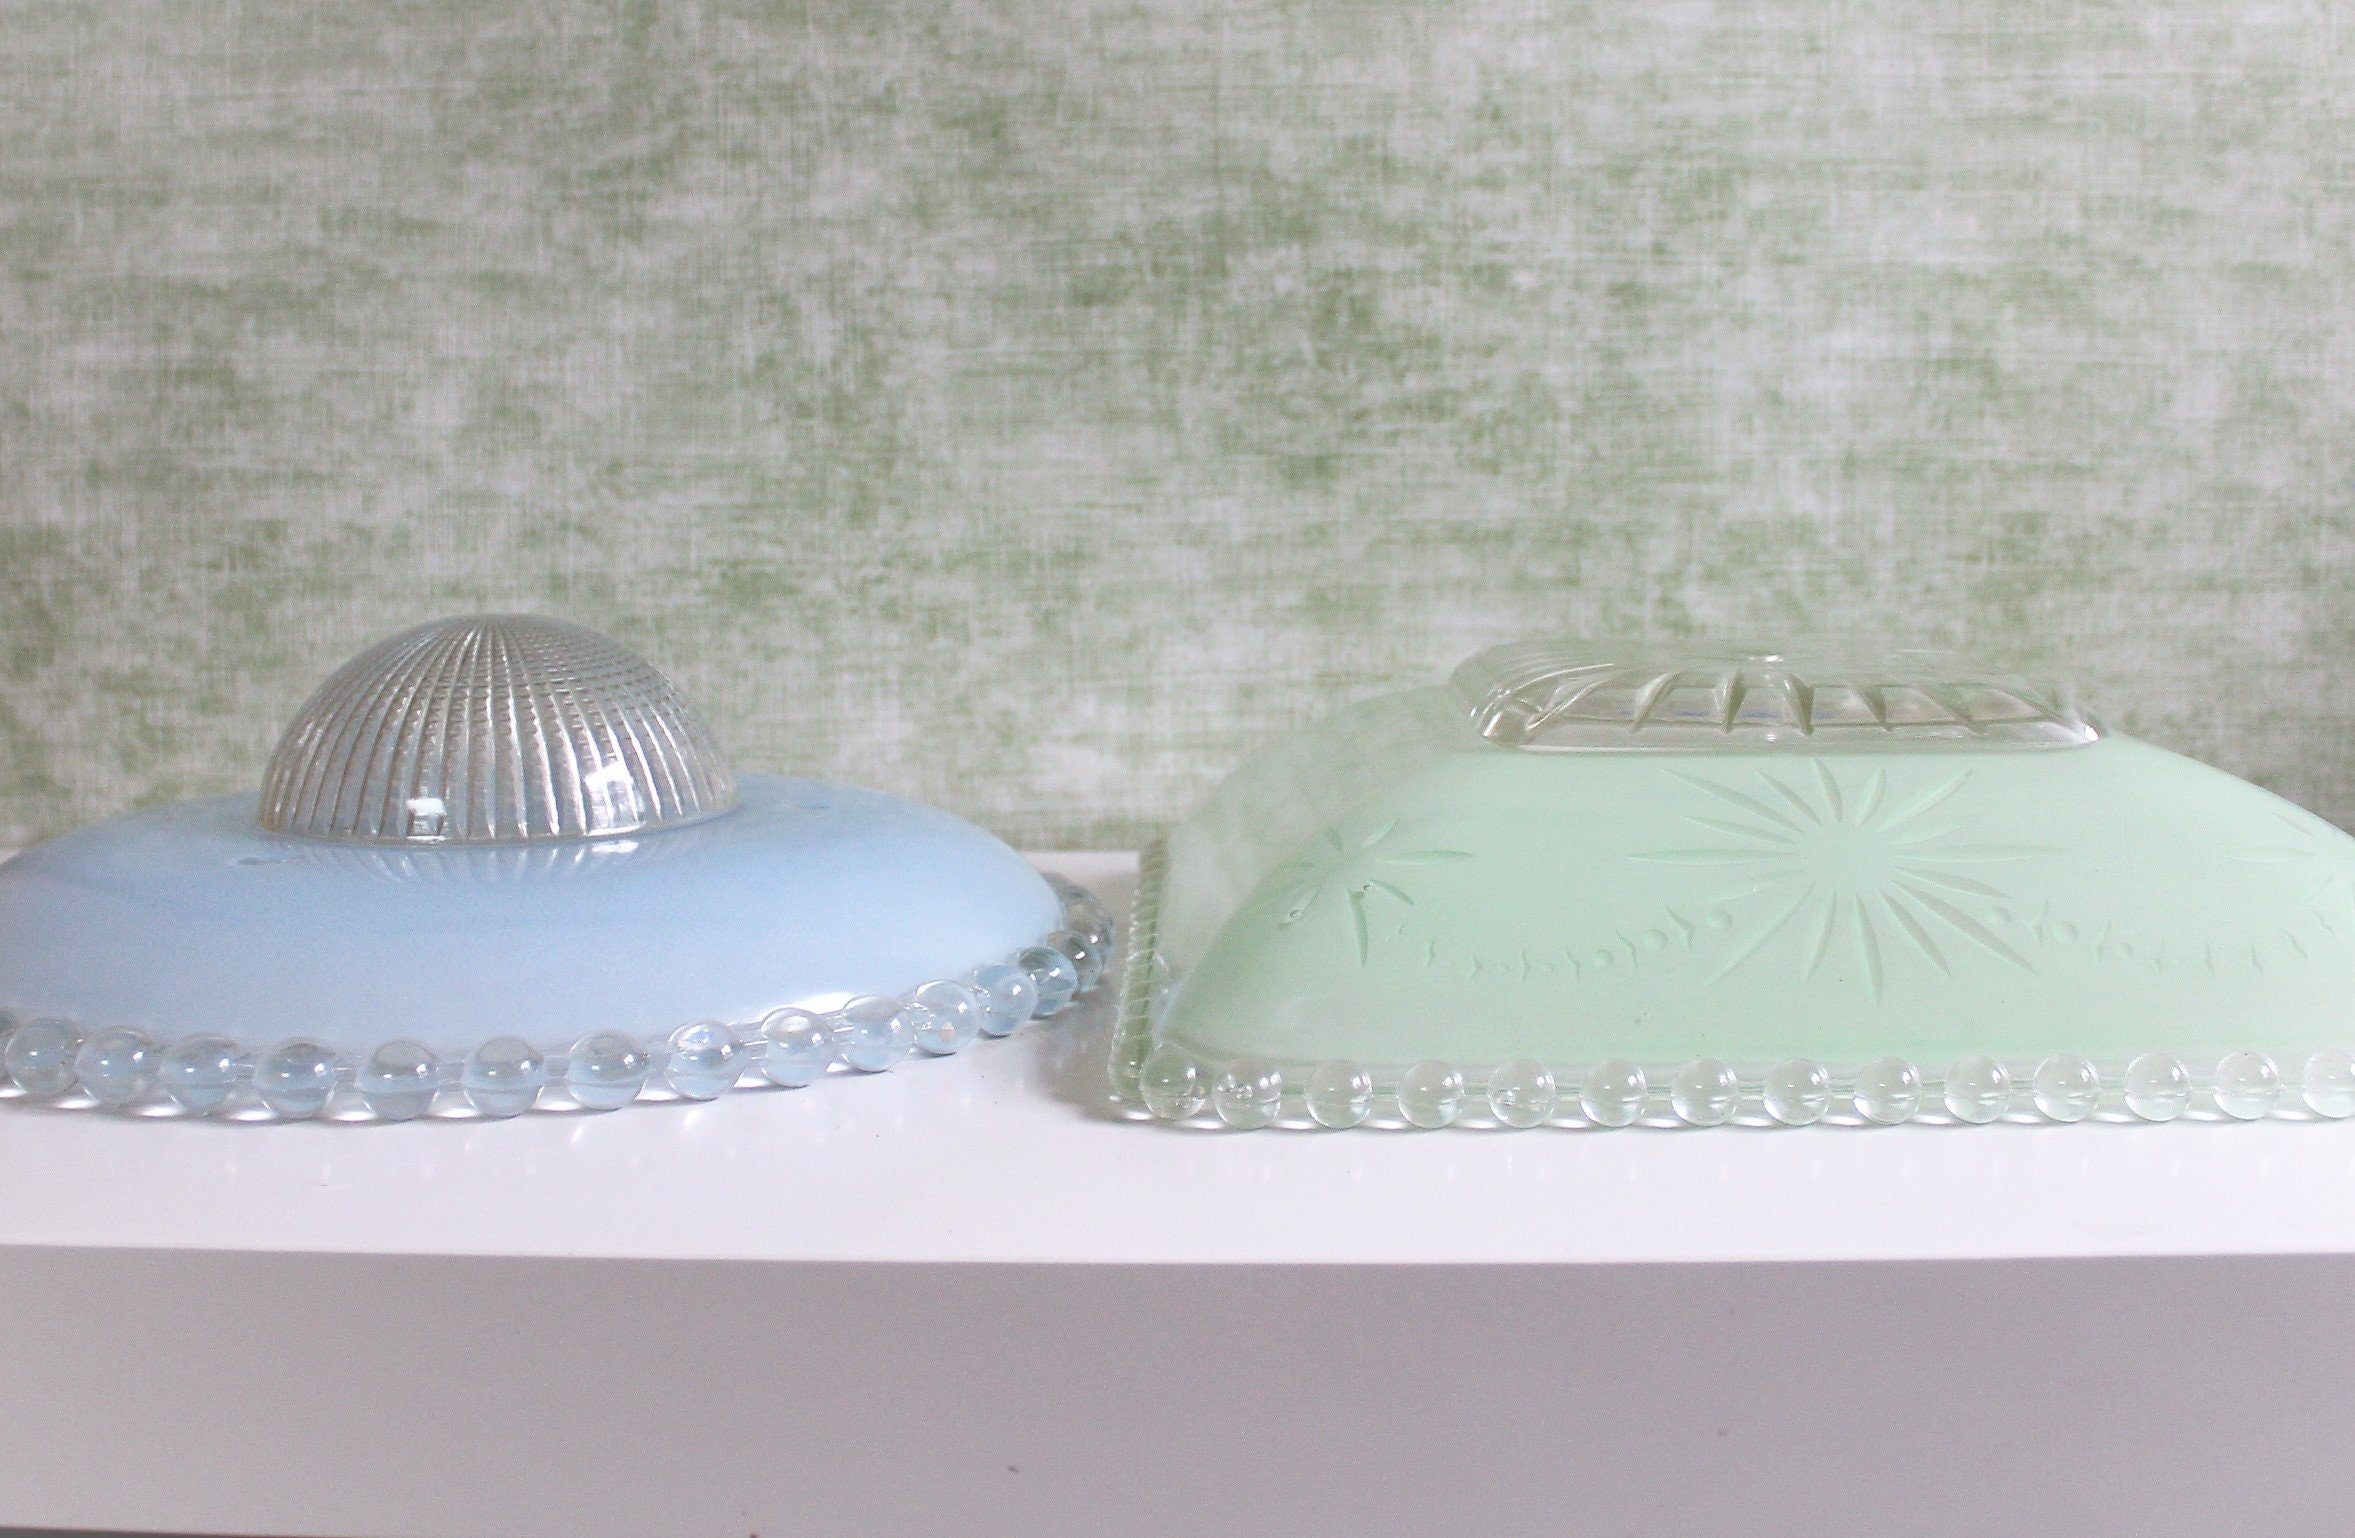 Vintage Decorative Glass Light Cover - Flushmount Clear